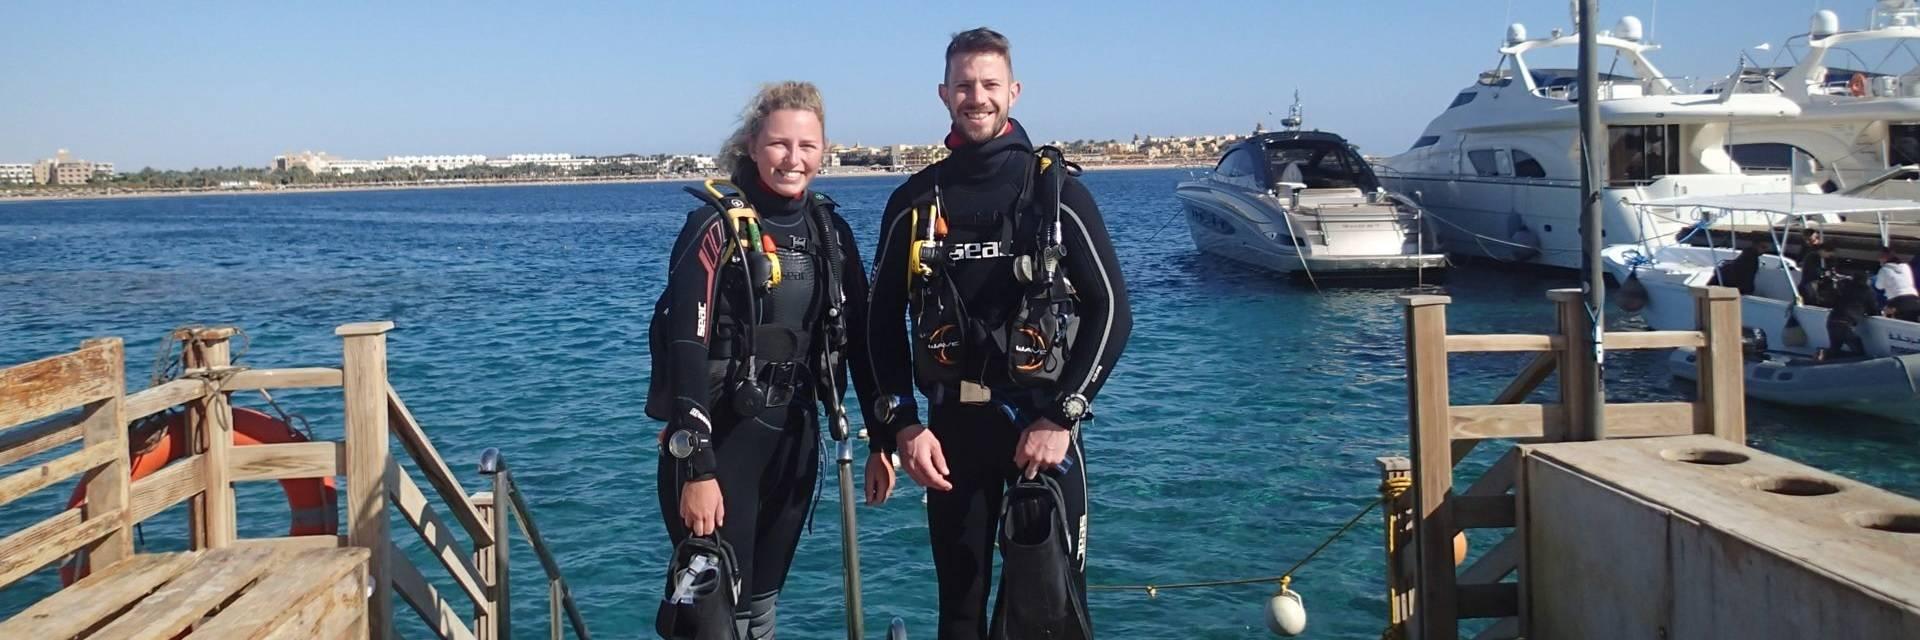 Divingthisworld buddy team